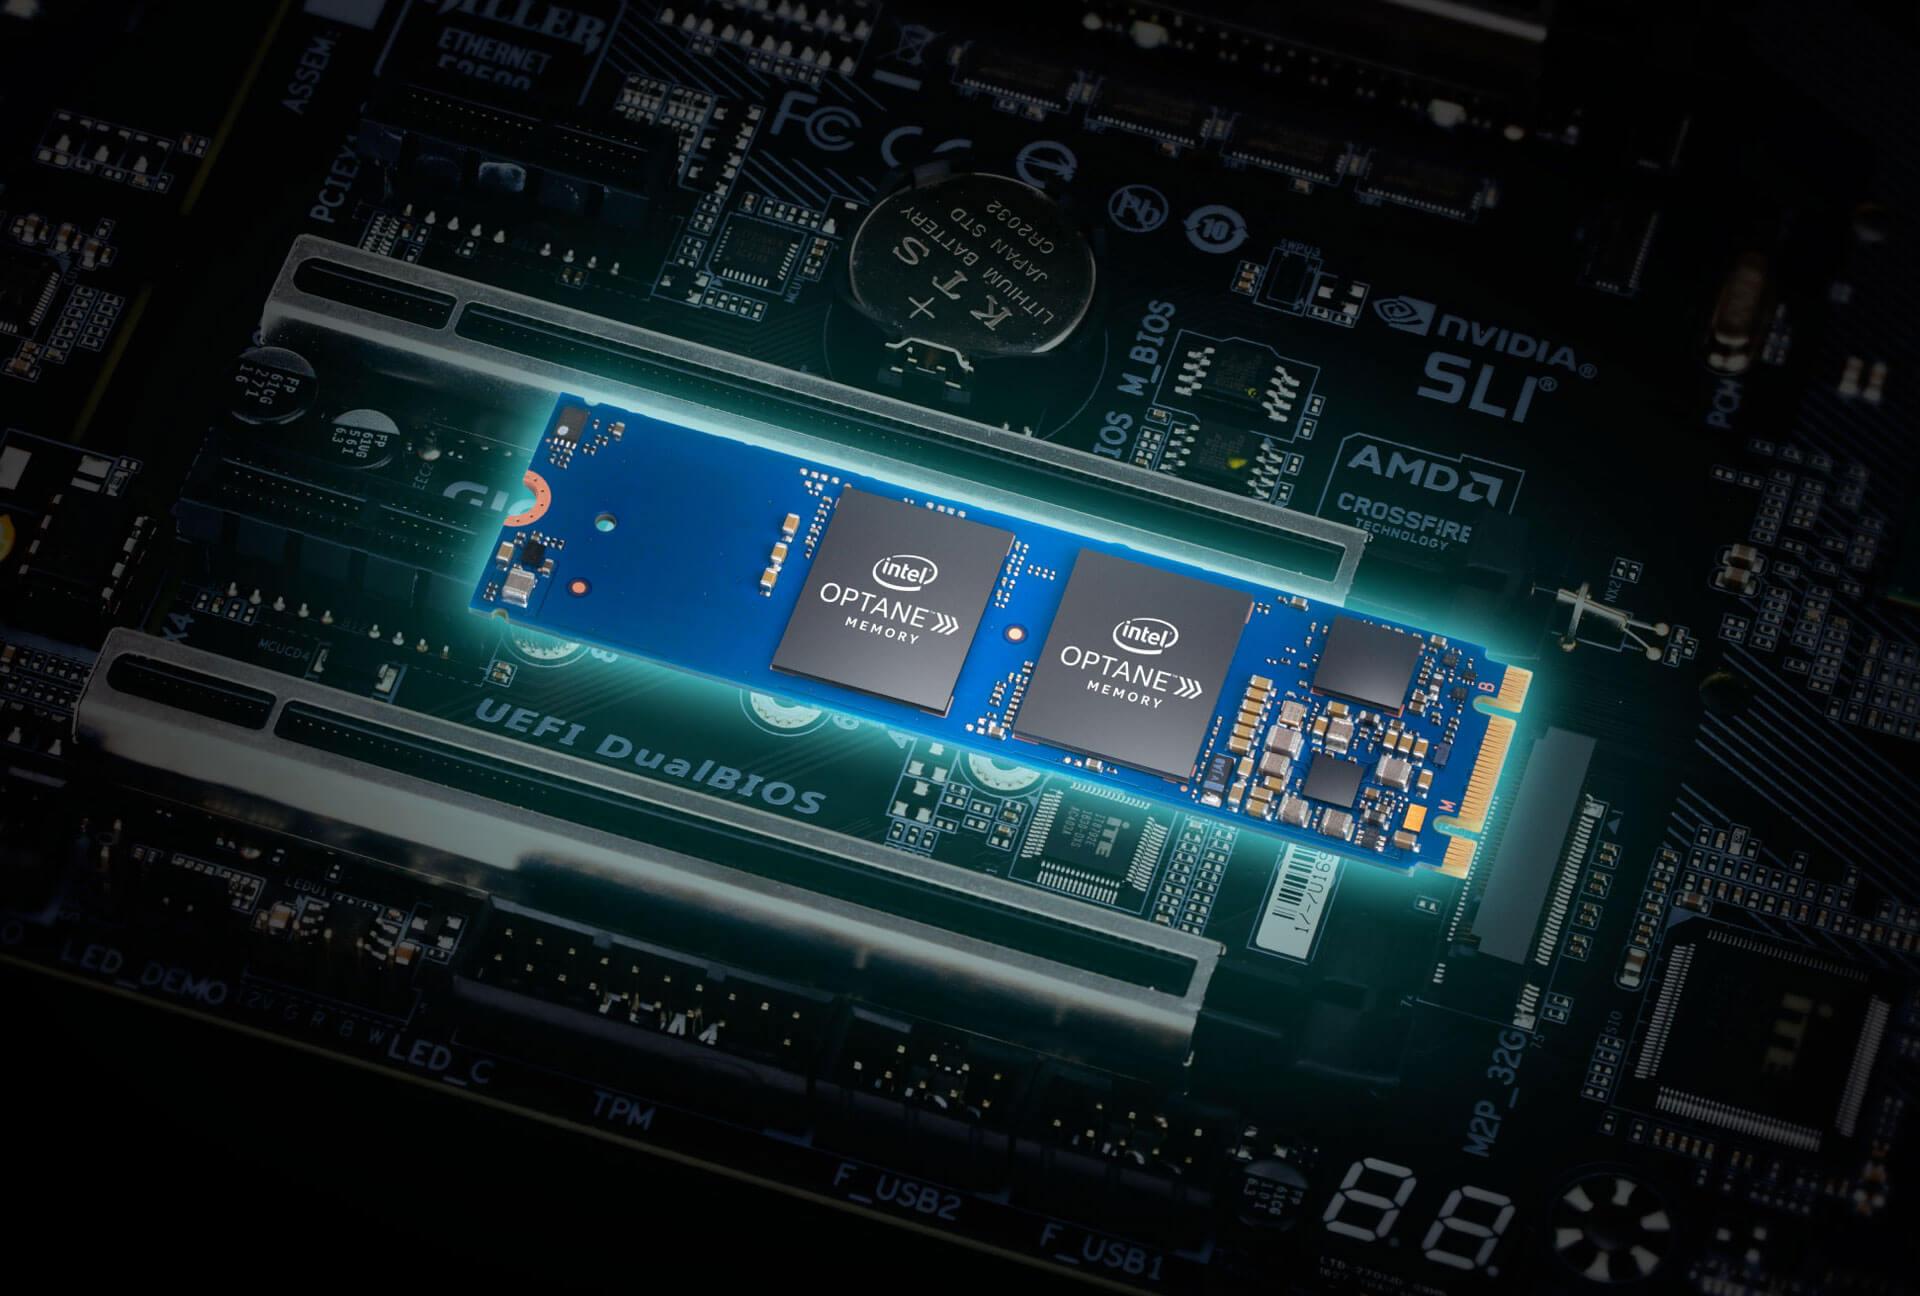 Gigabyte Z370p D3 Rev 10 Lga 1151 300 Series Intel Z370 Hdmi Home Gt Appliances Rv Appliance Circuit Boards General Information